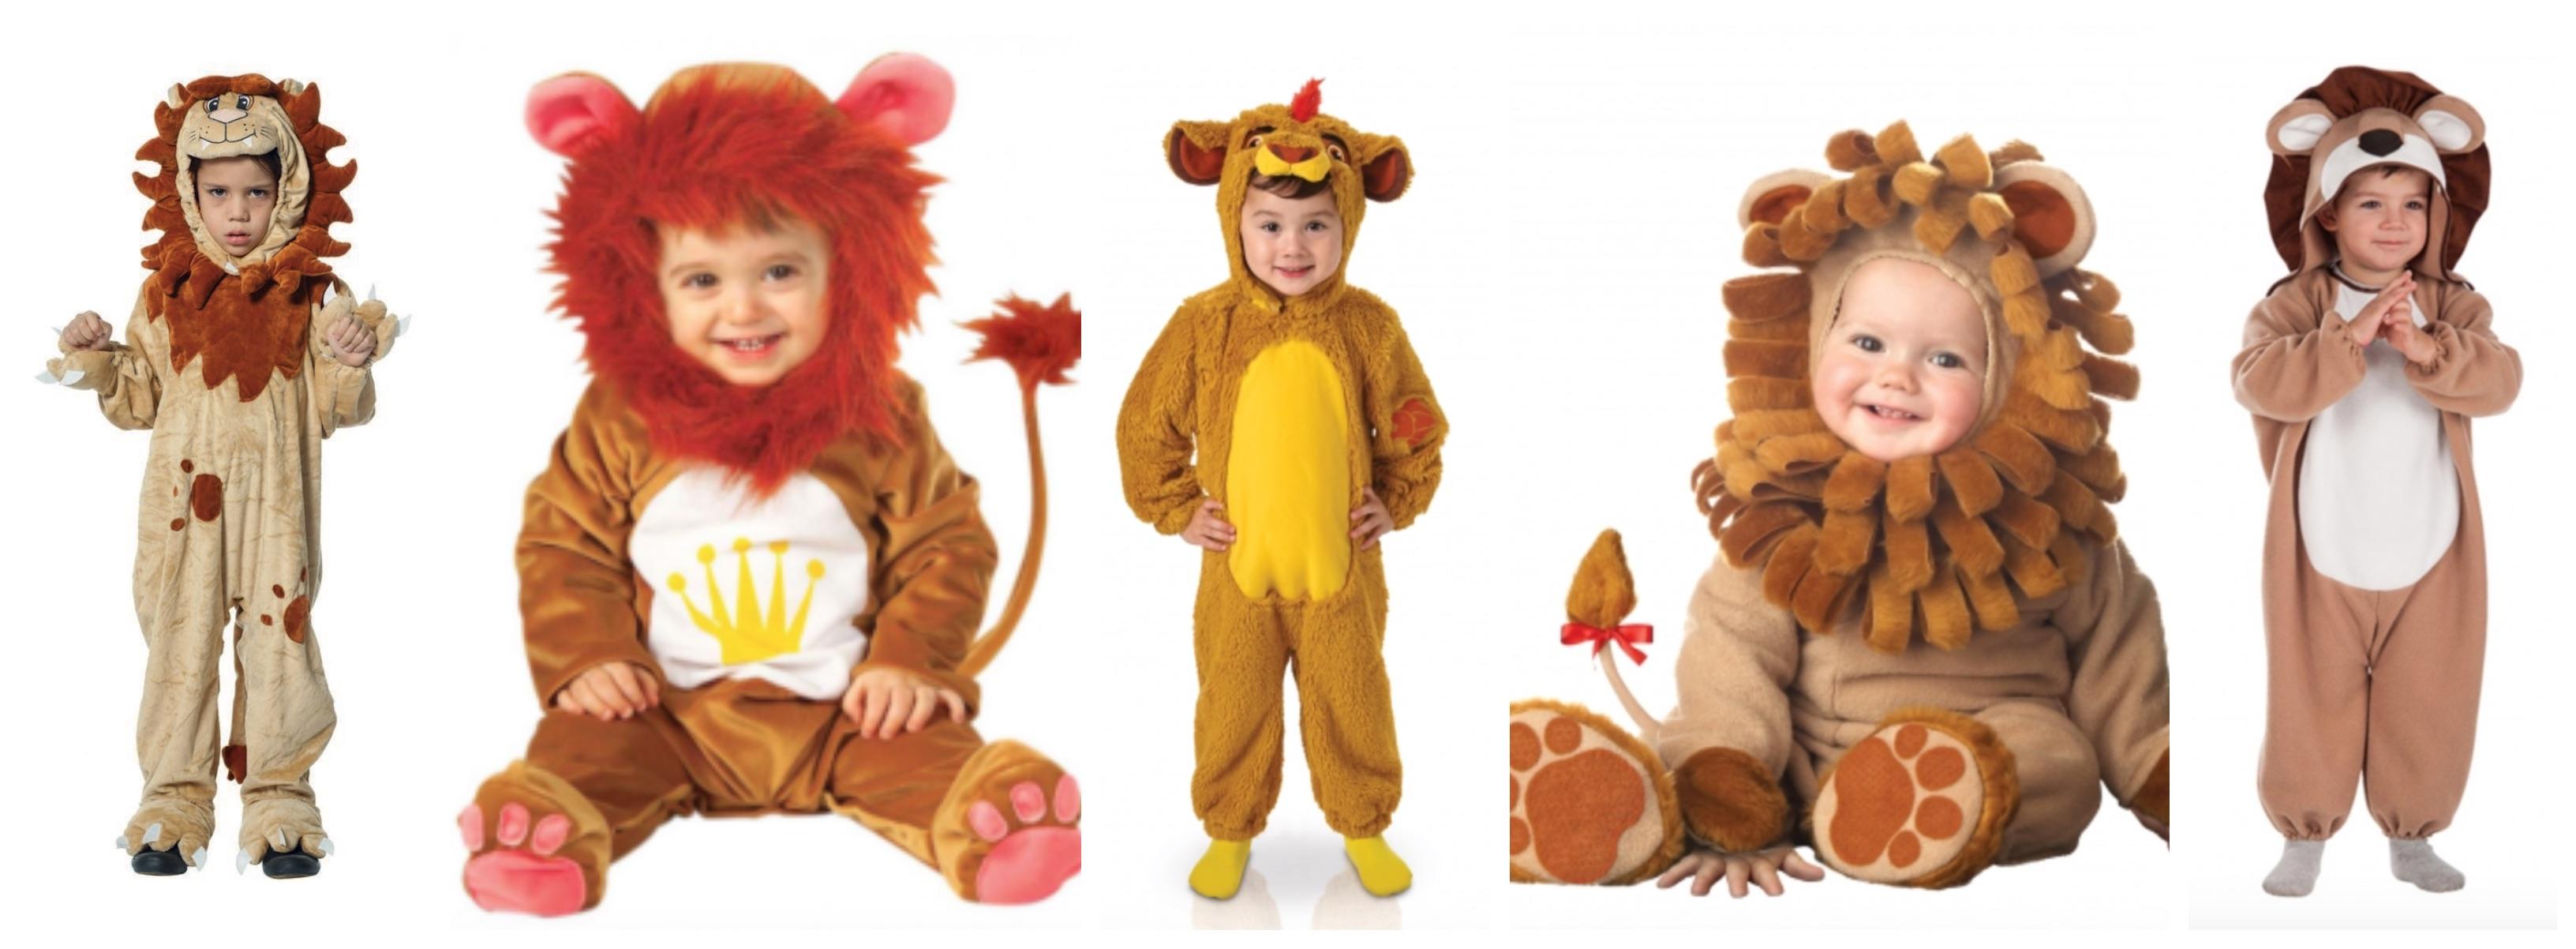 løve kostume til baby - Løve kostume til baby